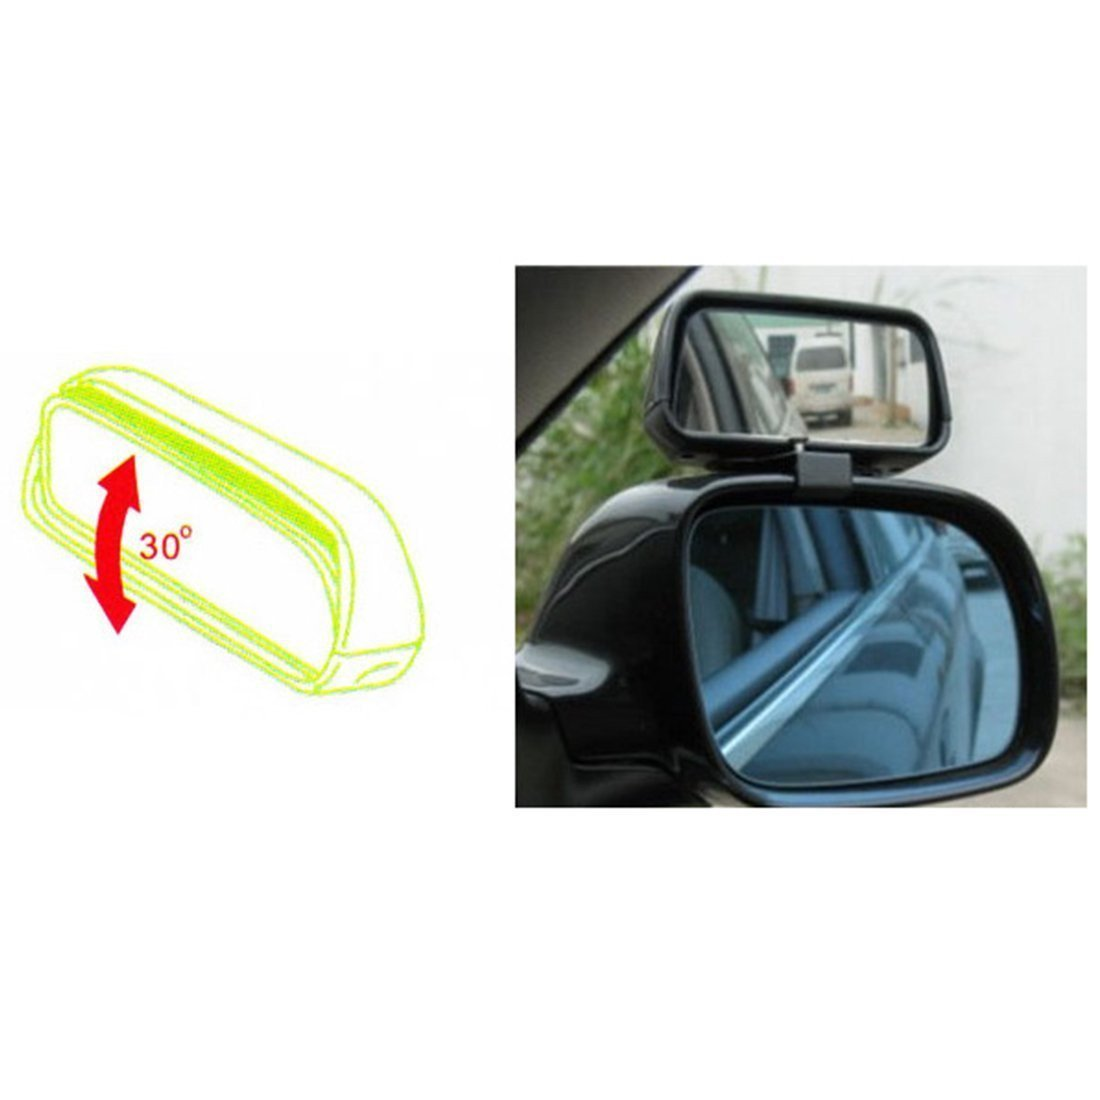 Replacement for 99-03 Acura TL UA4-UA5 4pcs Tape-On Window Visor Deflector Rain Guard